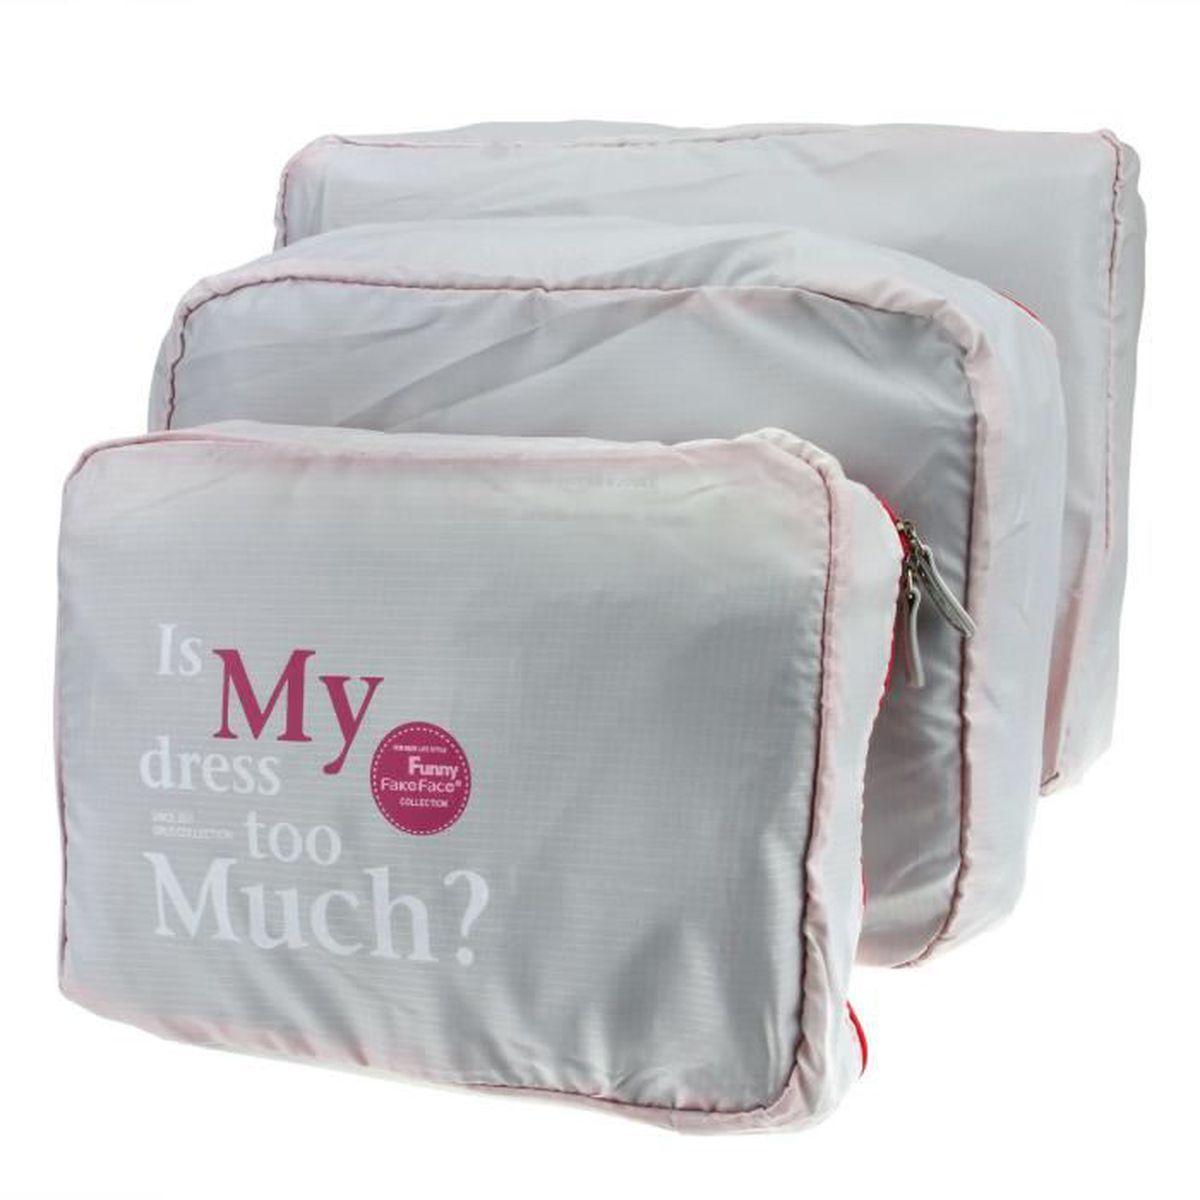 organisateur de bagage sac de rangement v tement semi creux stockage couverture voyage bagage. Black Bedroom Furniture Sets. Home Design Ideas